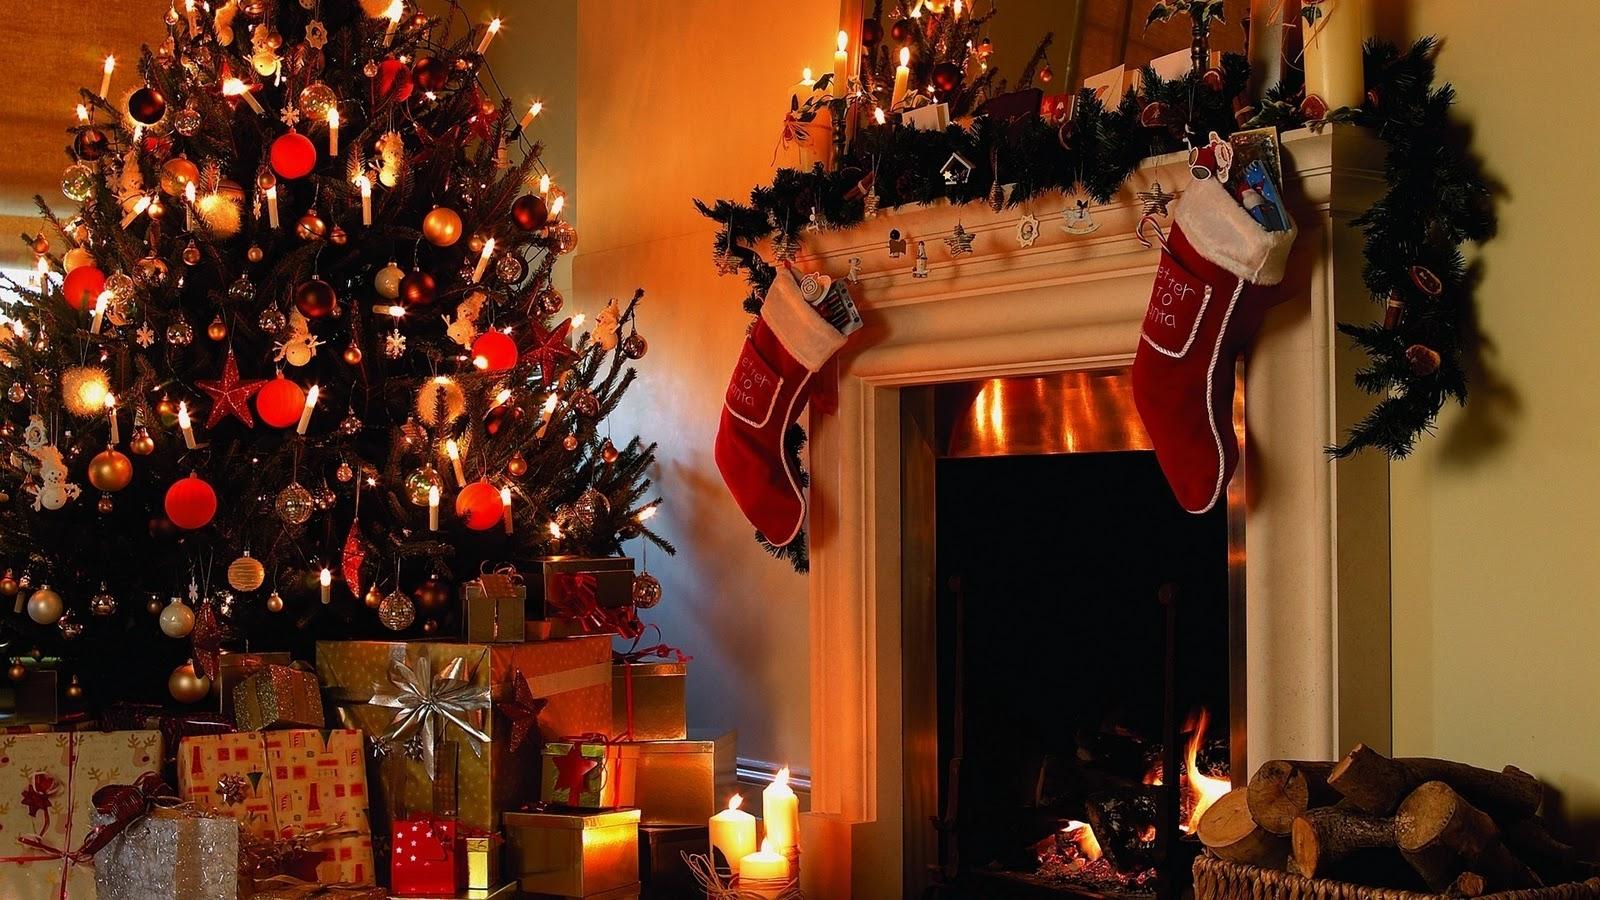 Christmas Tree and Fireplace wallpaper Desktop Wallpapers 1600x900